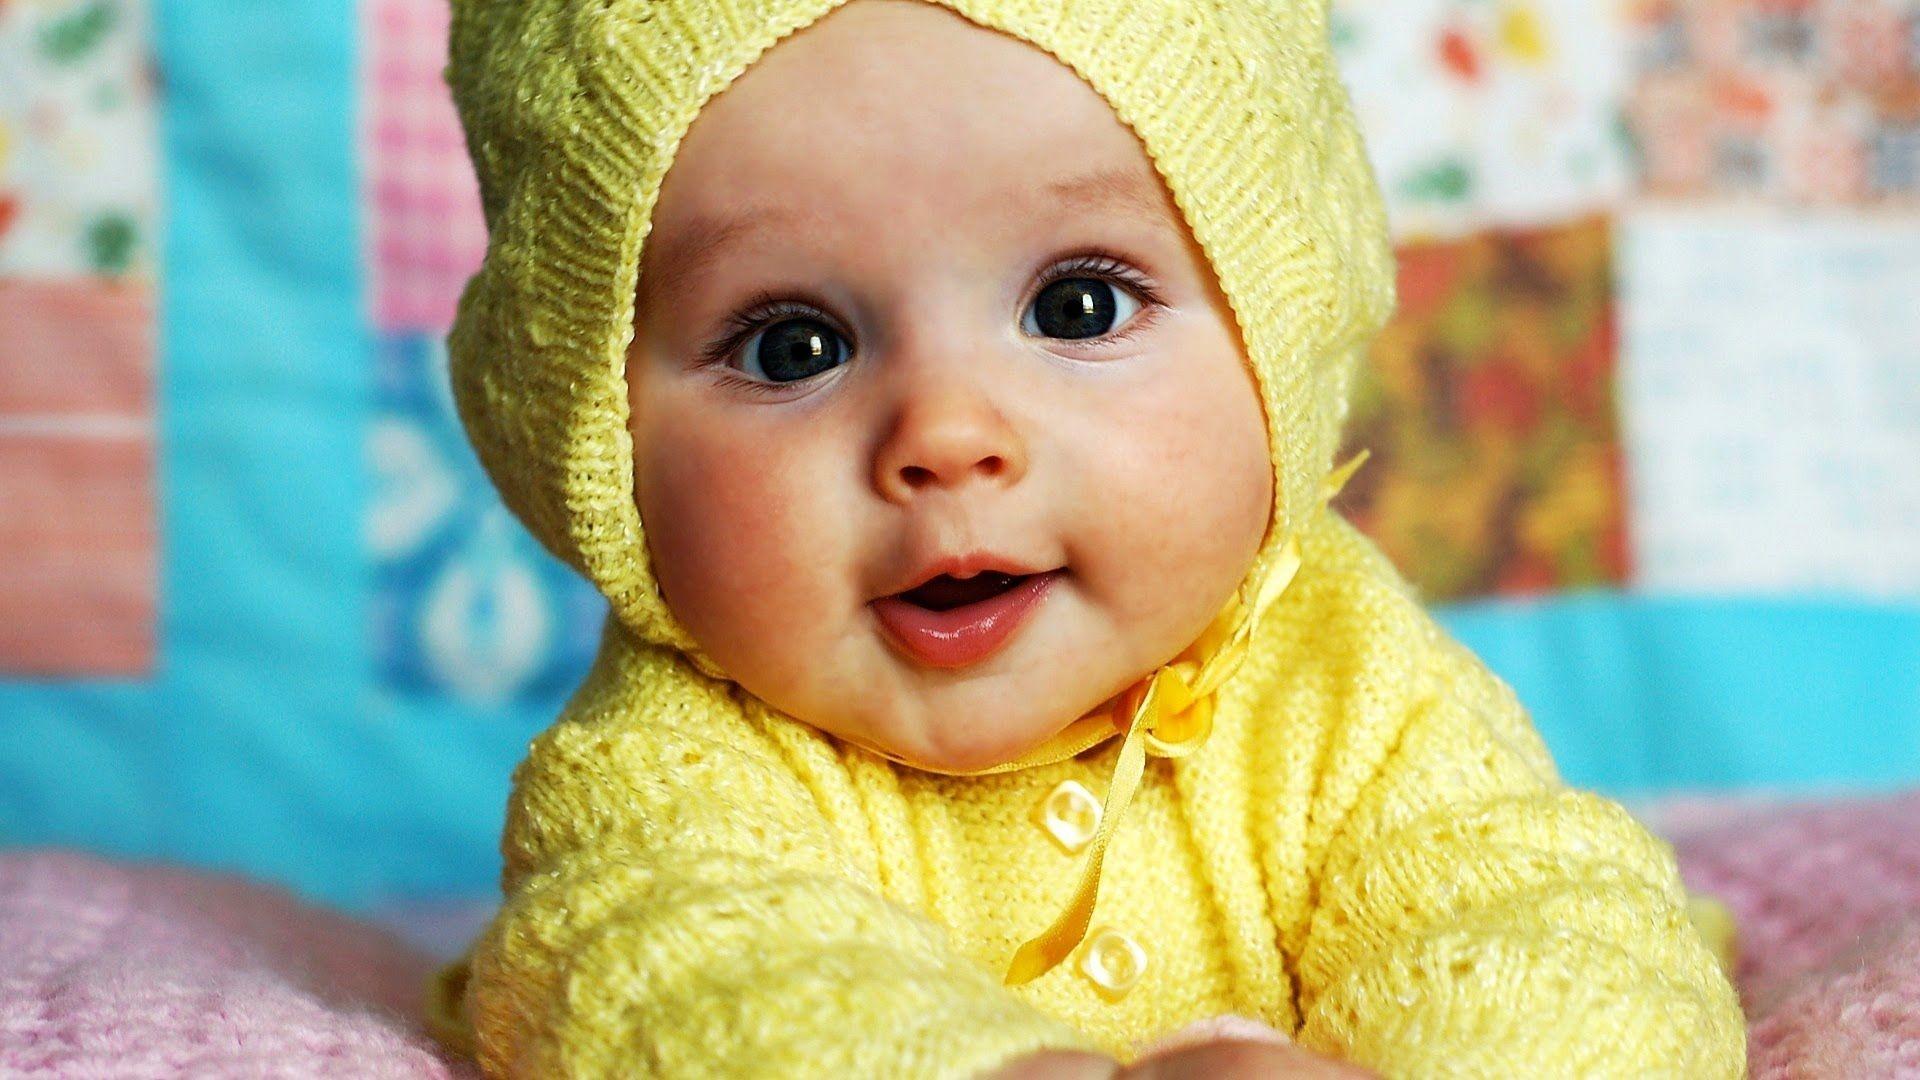 Beautiful Babies Wallpapers  Wallpaper